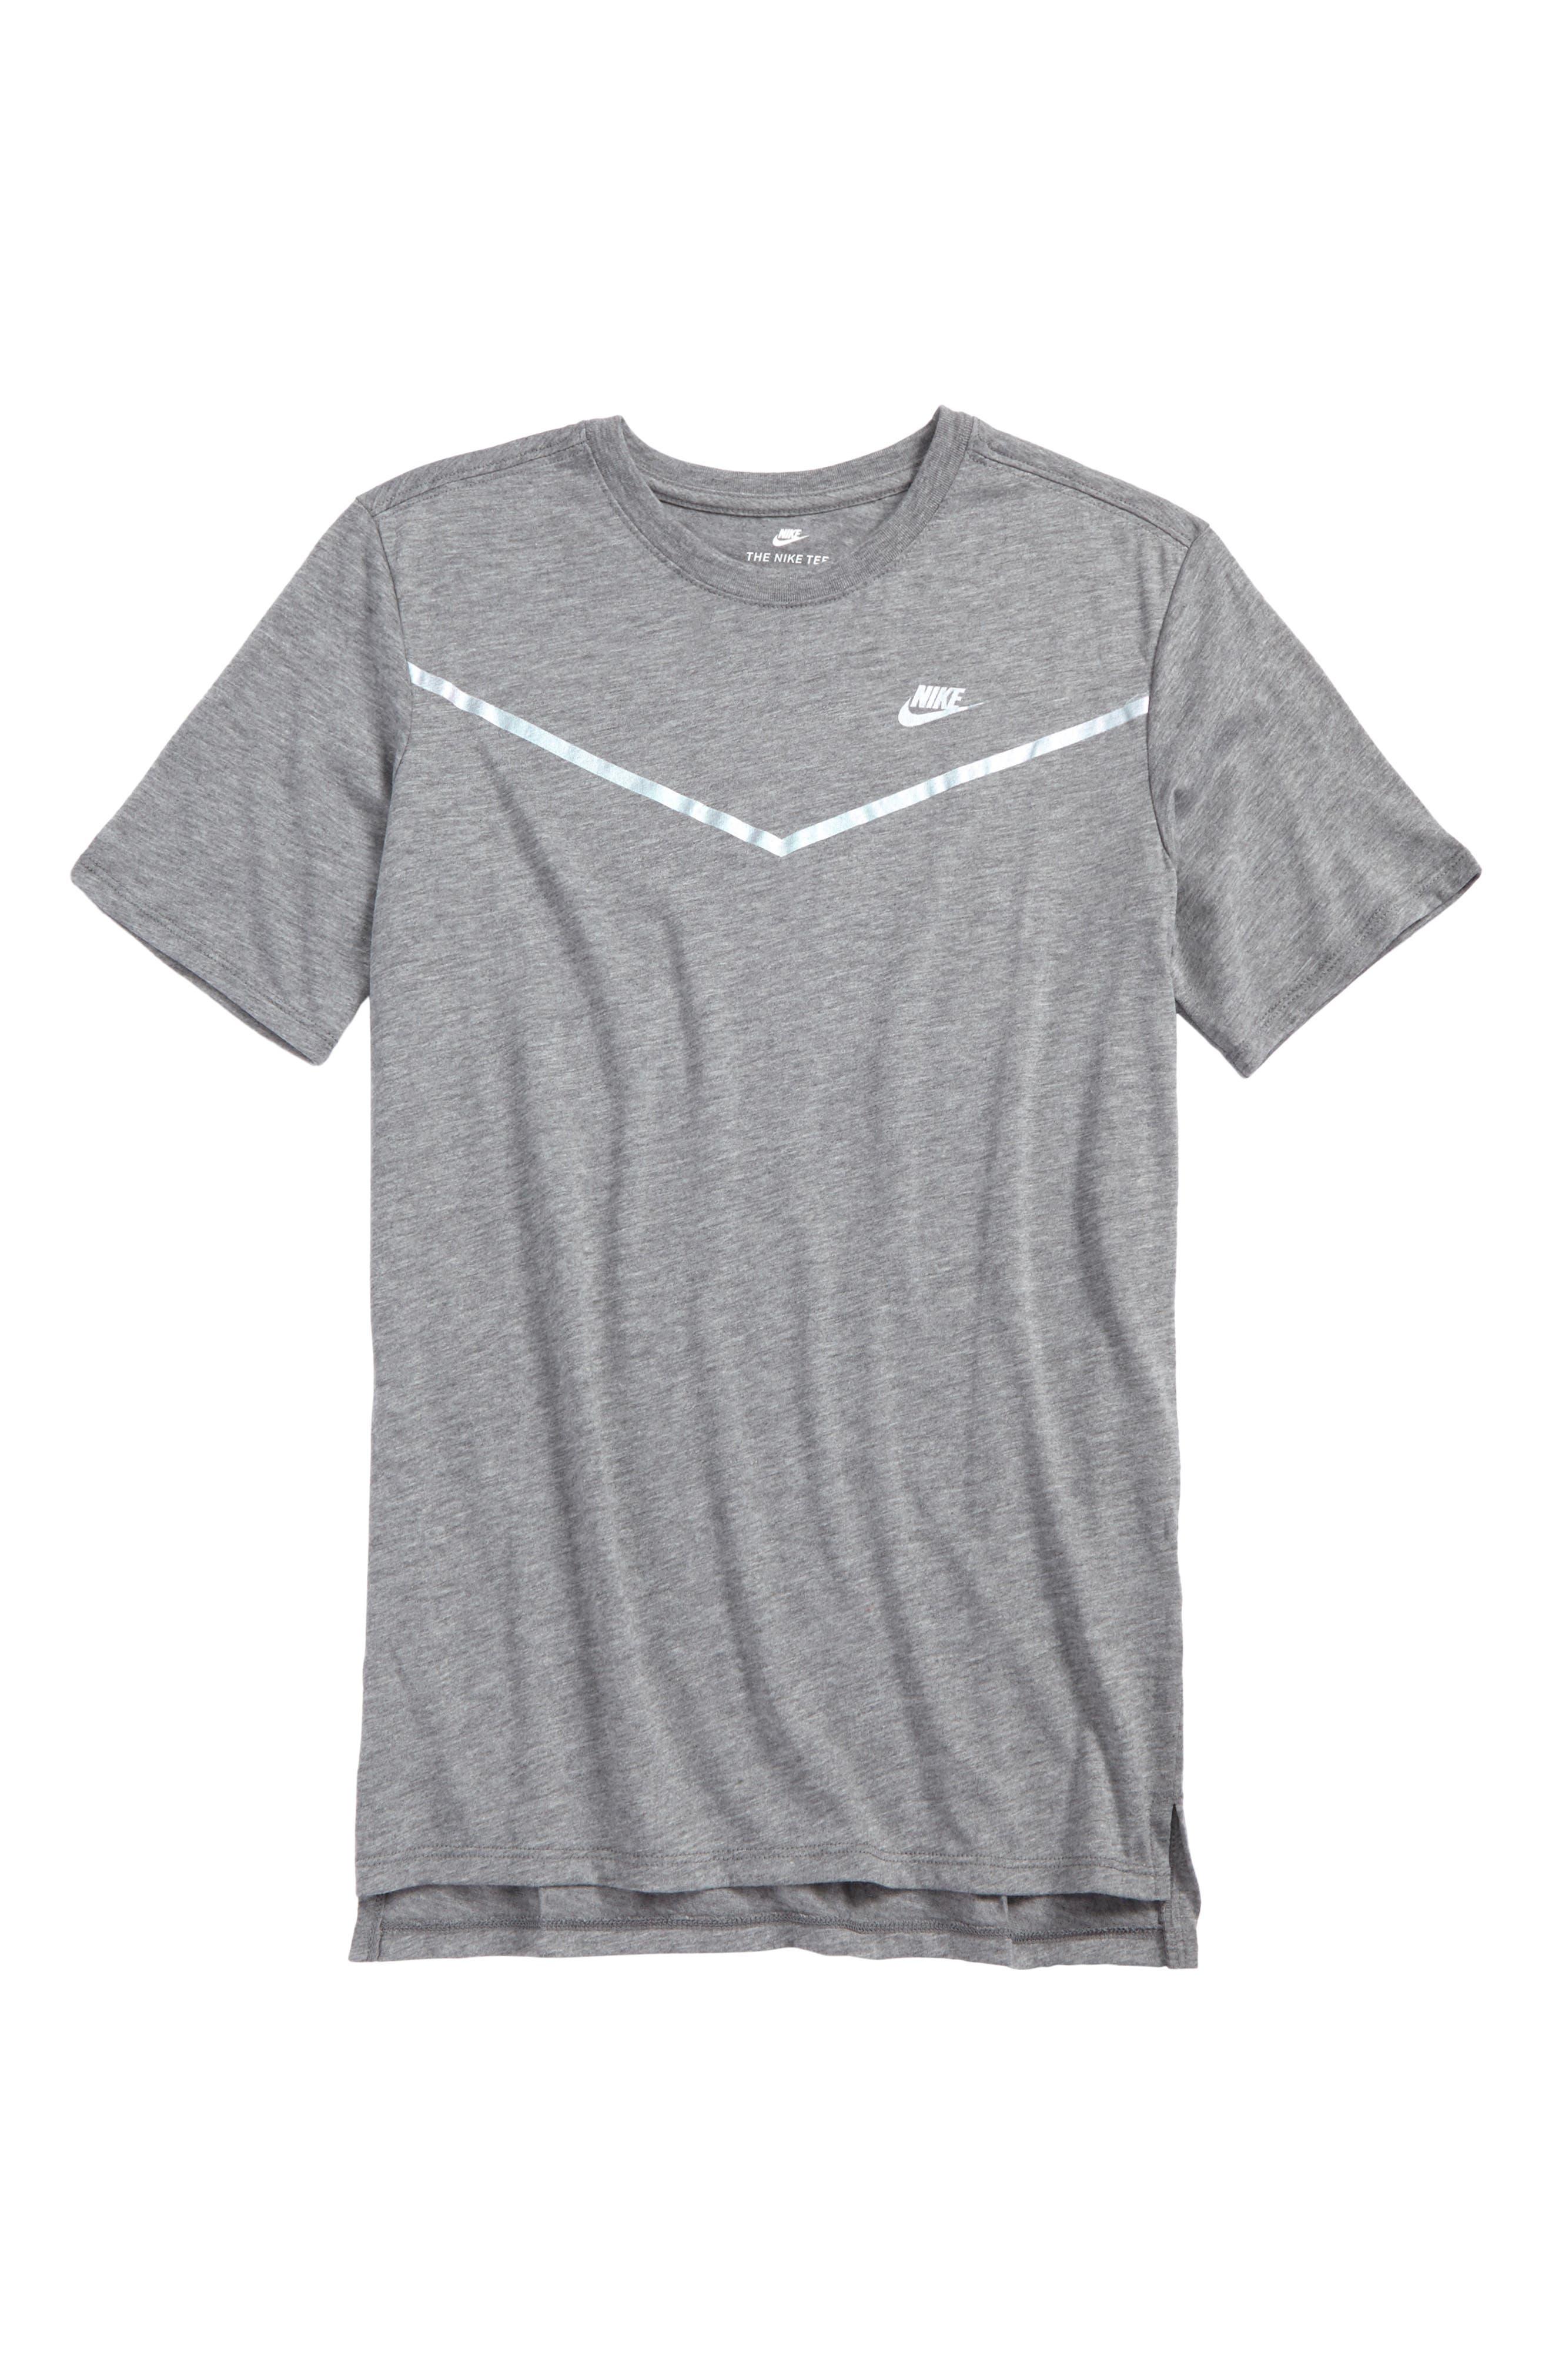 Alternate Image 1 Selected - Nike Dry Futura T-Shirt (Little Boys & Big Boys)